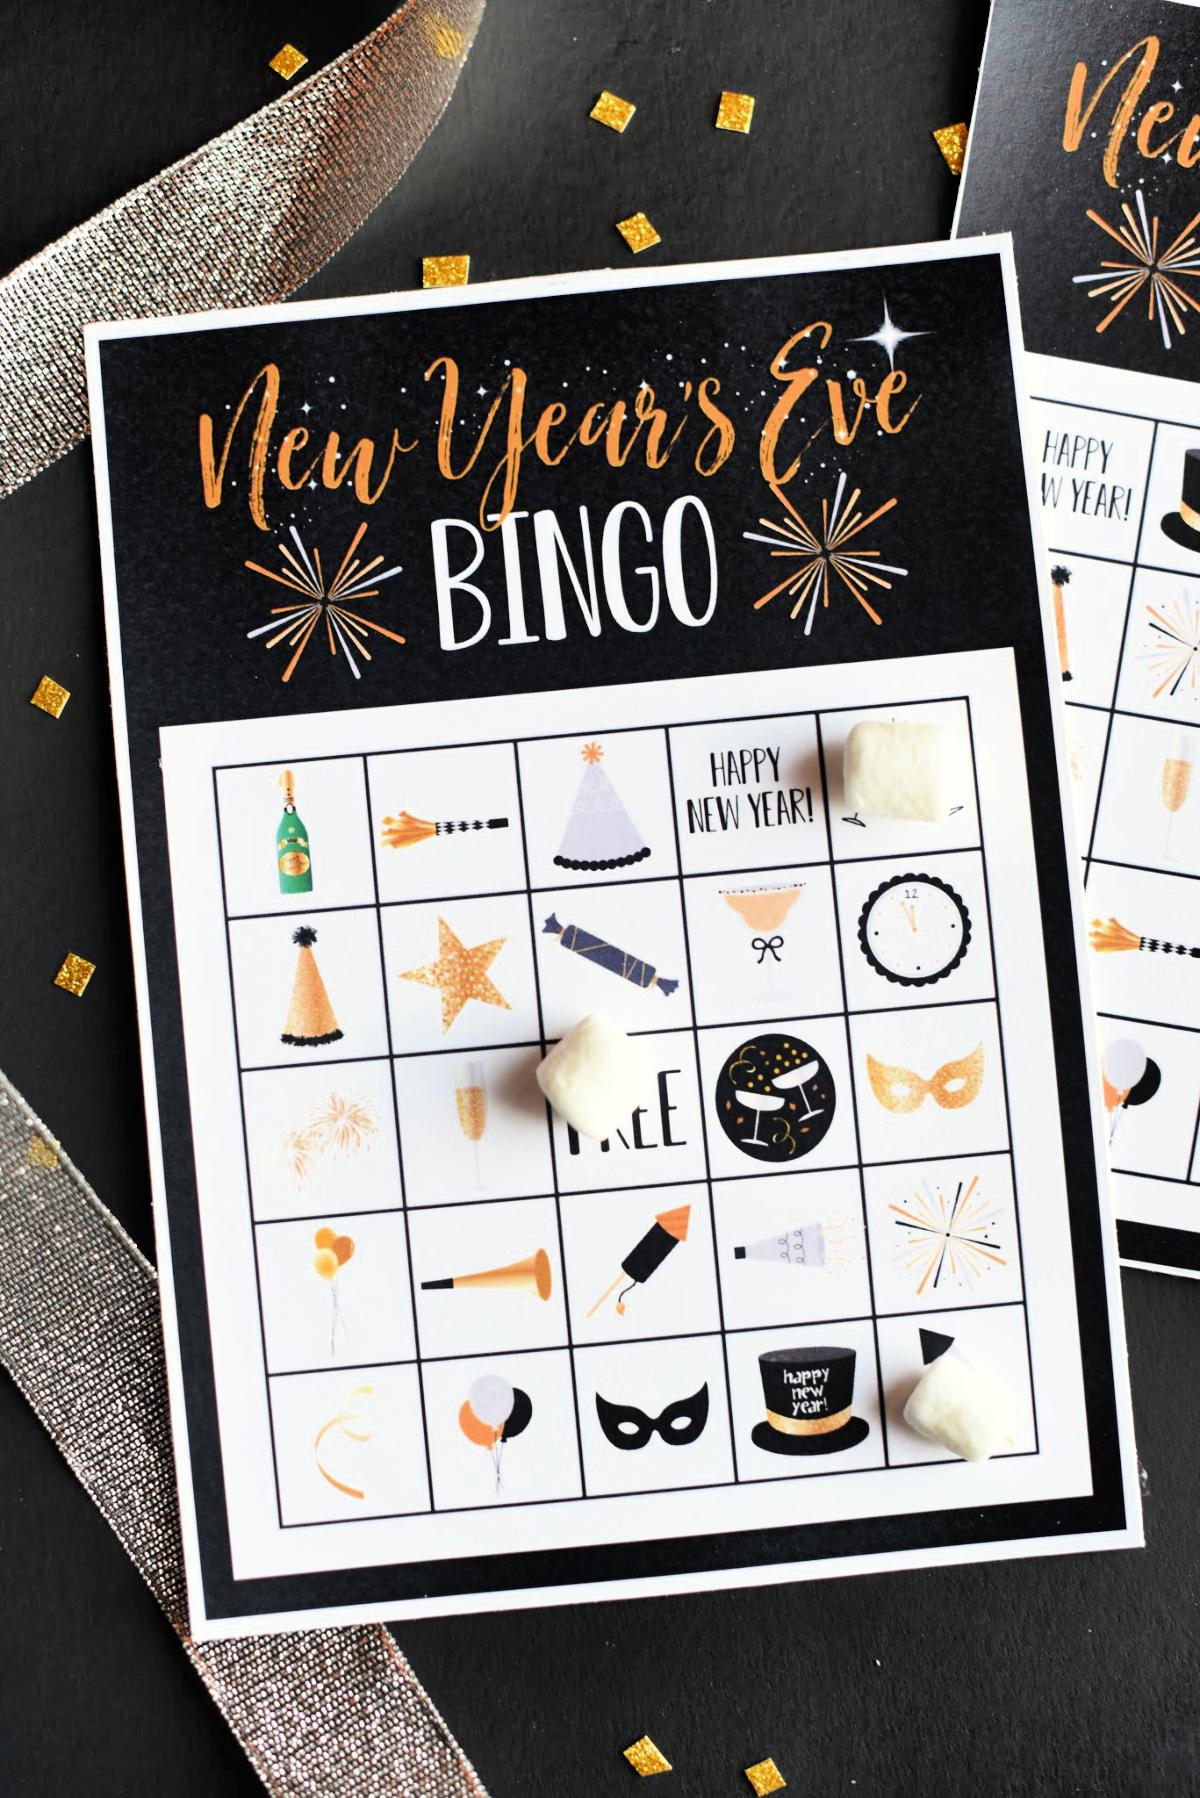 New Year's Eve Bingo Game